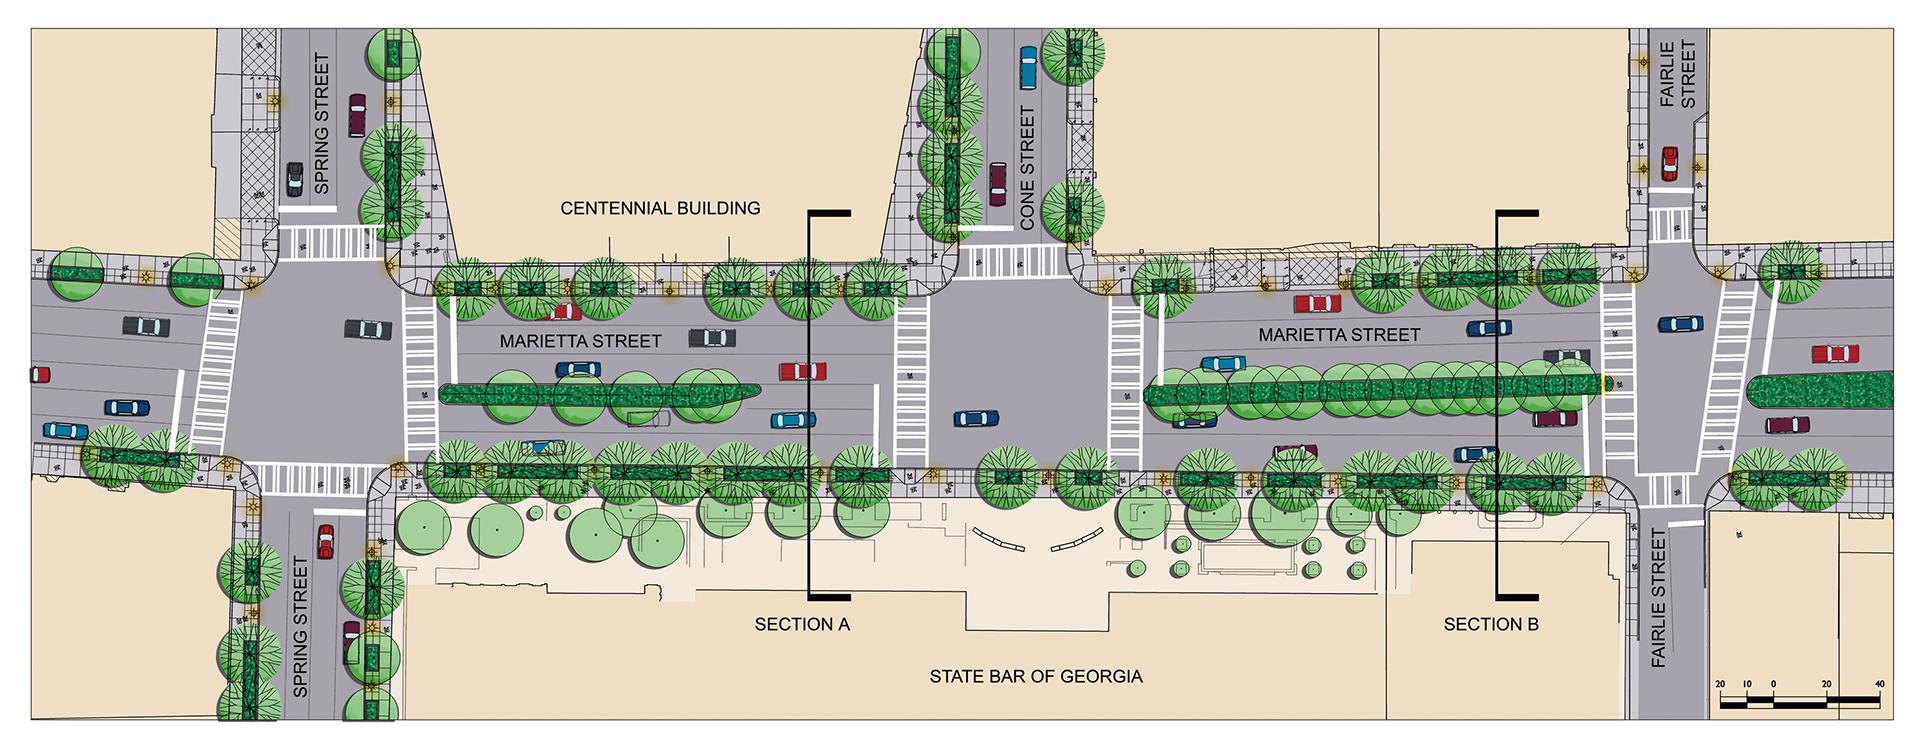 atlanta streetscapes enlargement plan